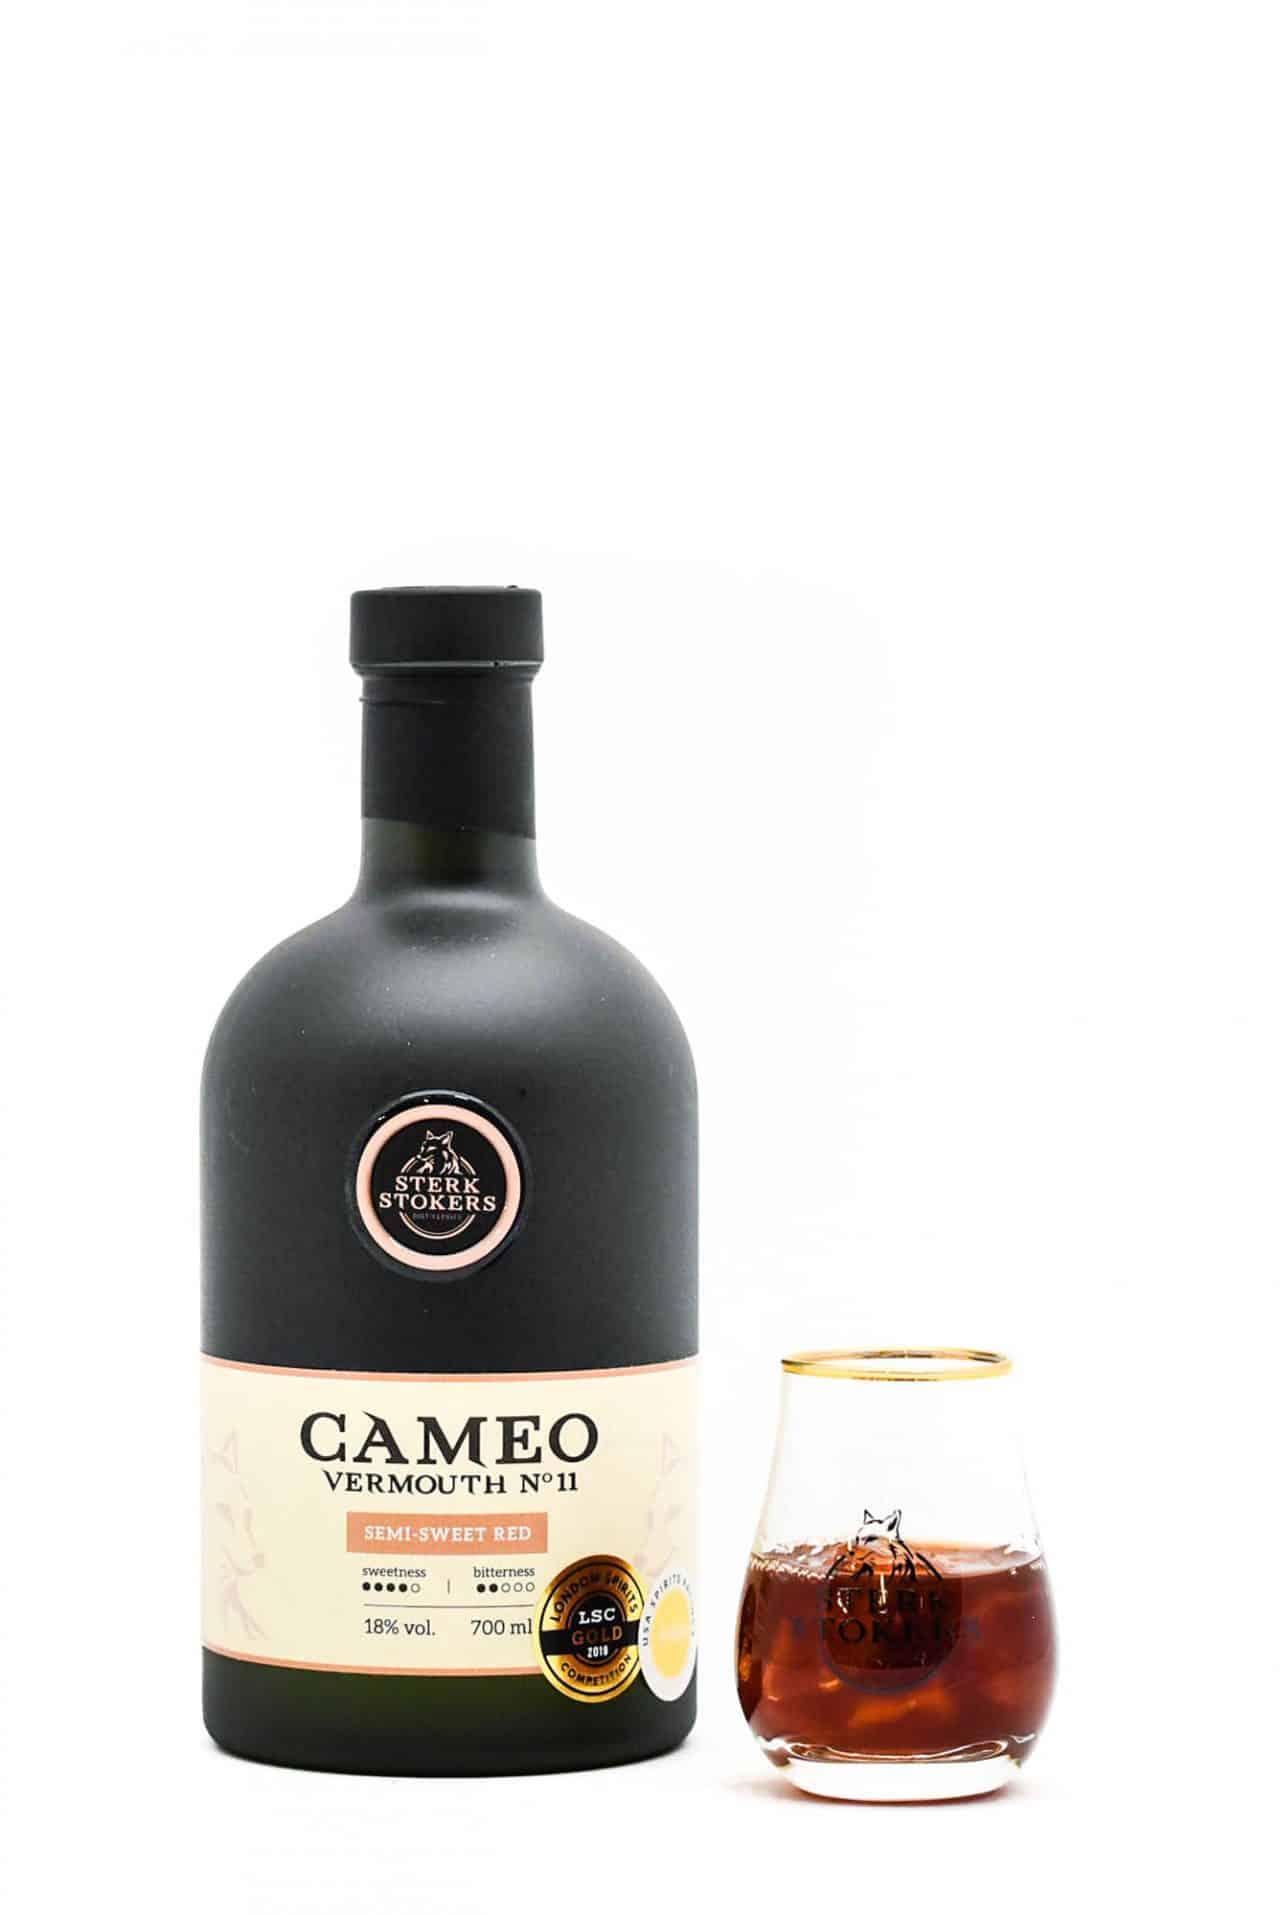 Cameo Vermouth 11 van Sterkstokers met glas